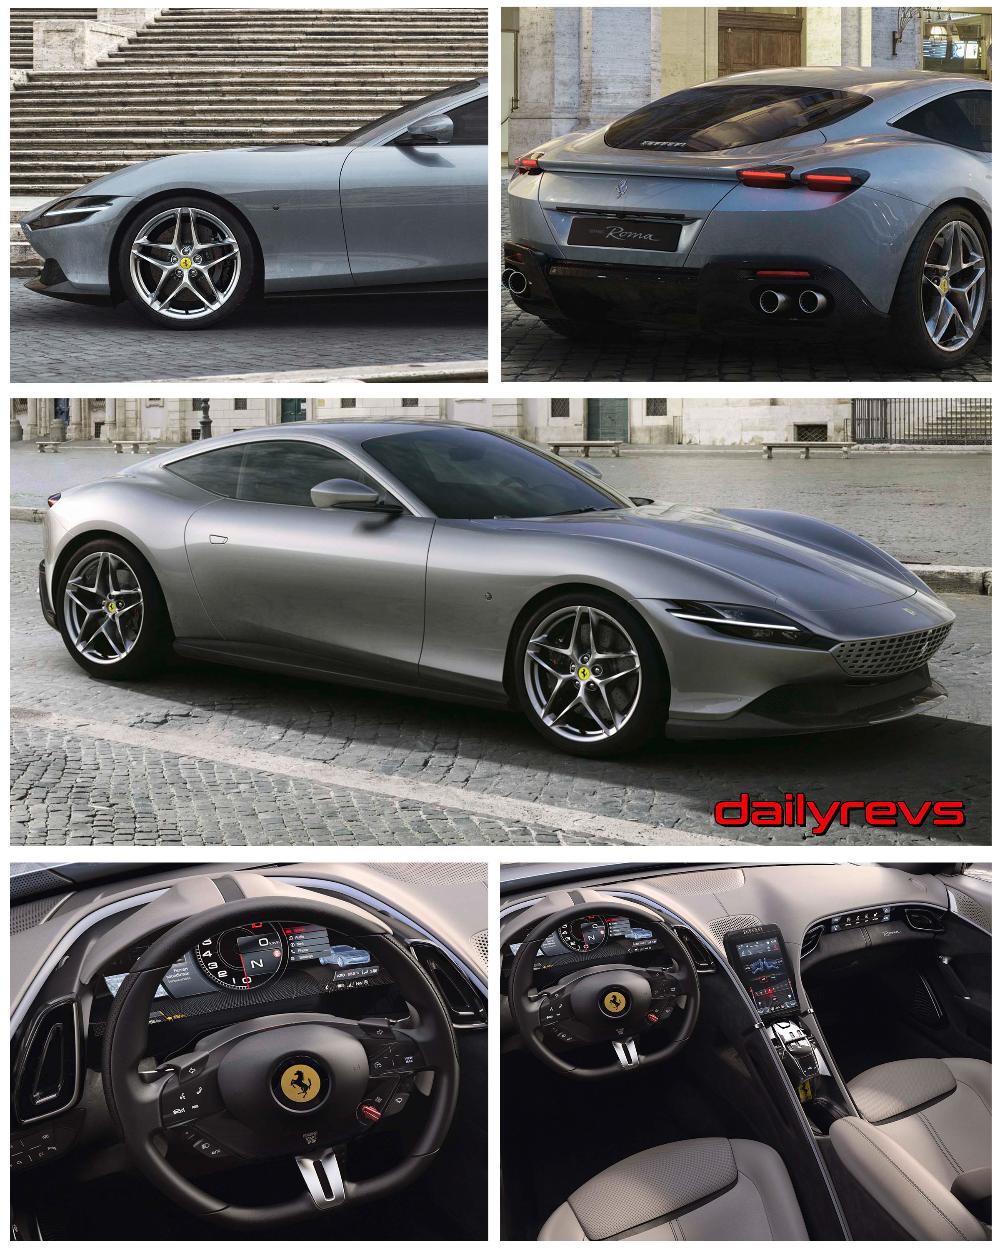 2020 Ferrari Roma Hd Pictures Videos Specs Informations In 2020 Ferrari Sports Cars Luxury Super Cars